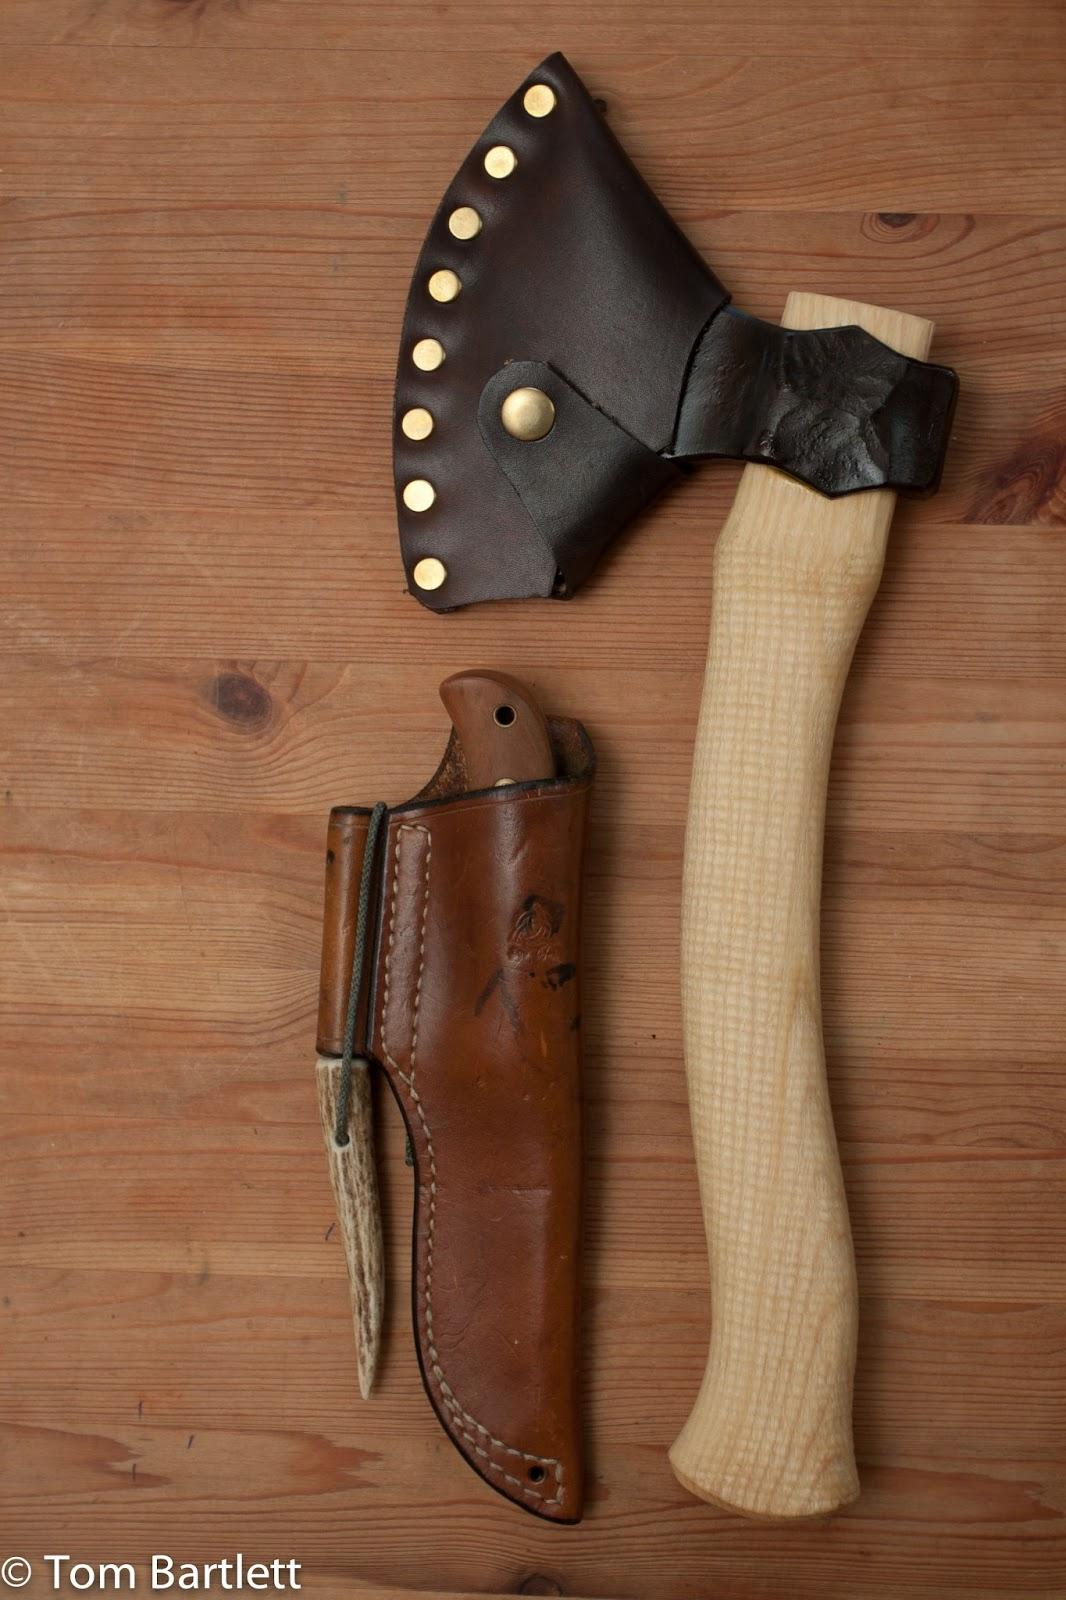 viking adze. a hk 50mm adze, svante djarv little viking axe and gransfors bruks wildlife hatchet. below it is my ben orford woodlander with the adze